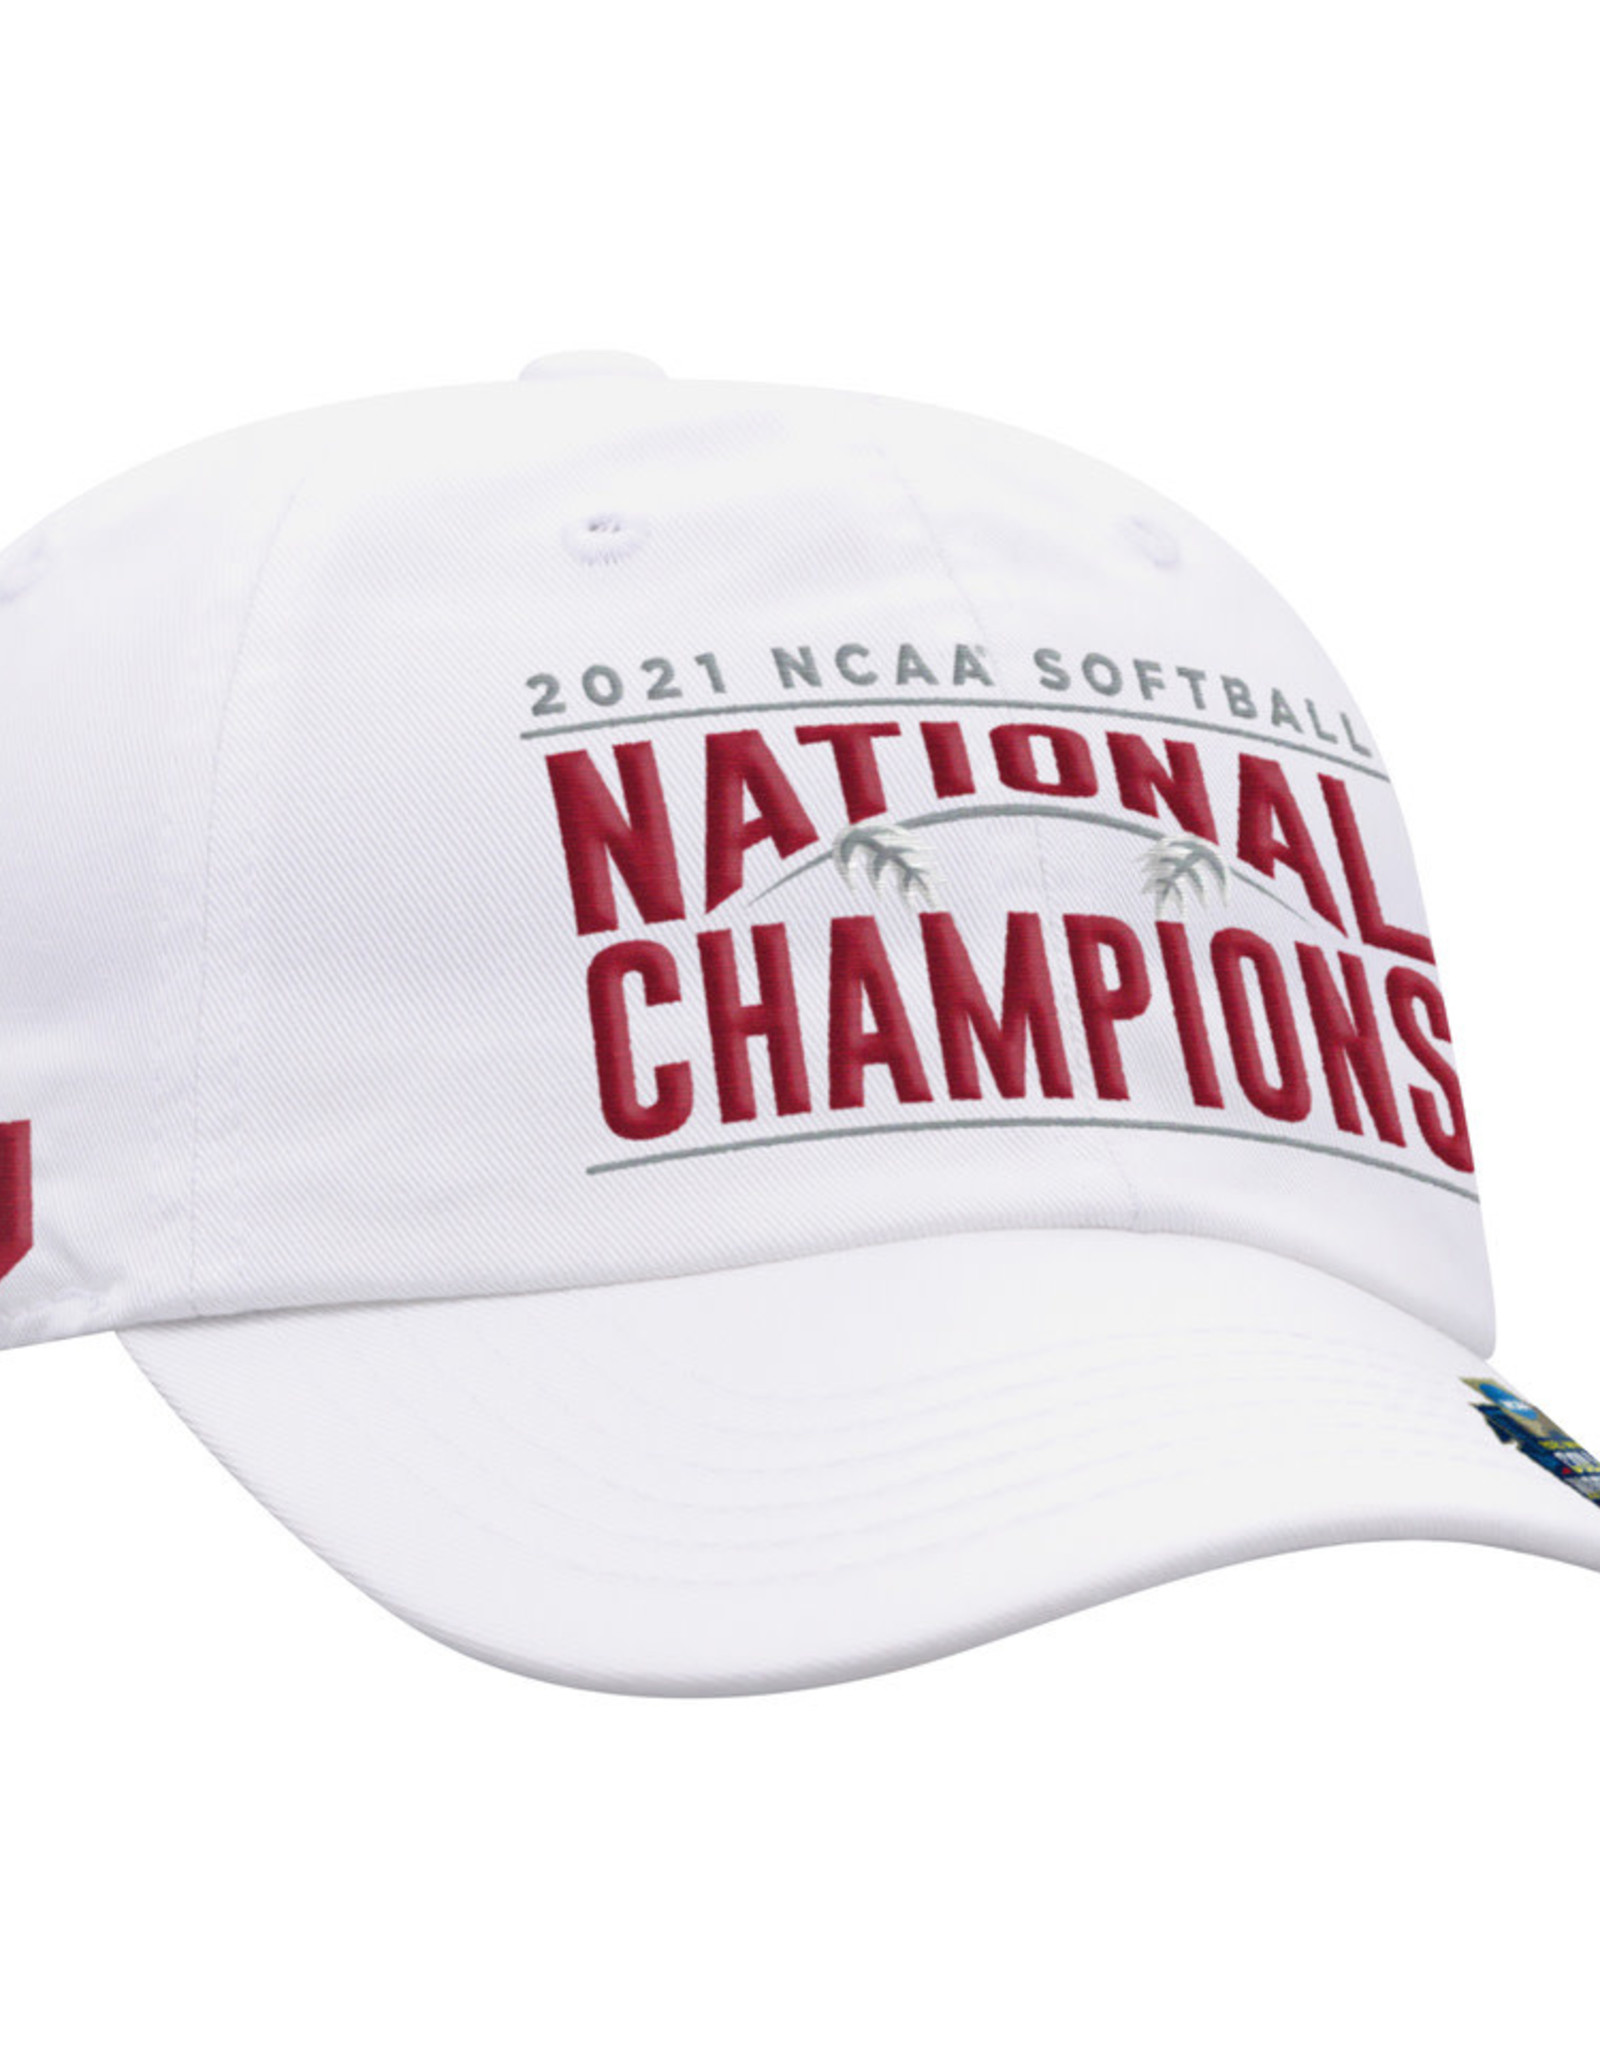 TOW 2021 OU Softball National Champions Lockerroom Hat